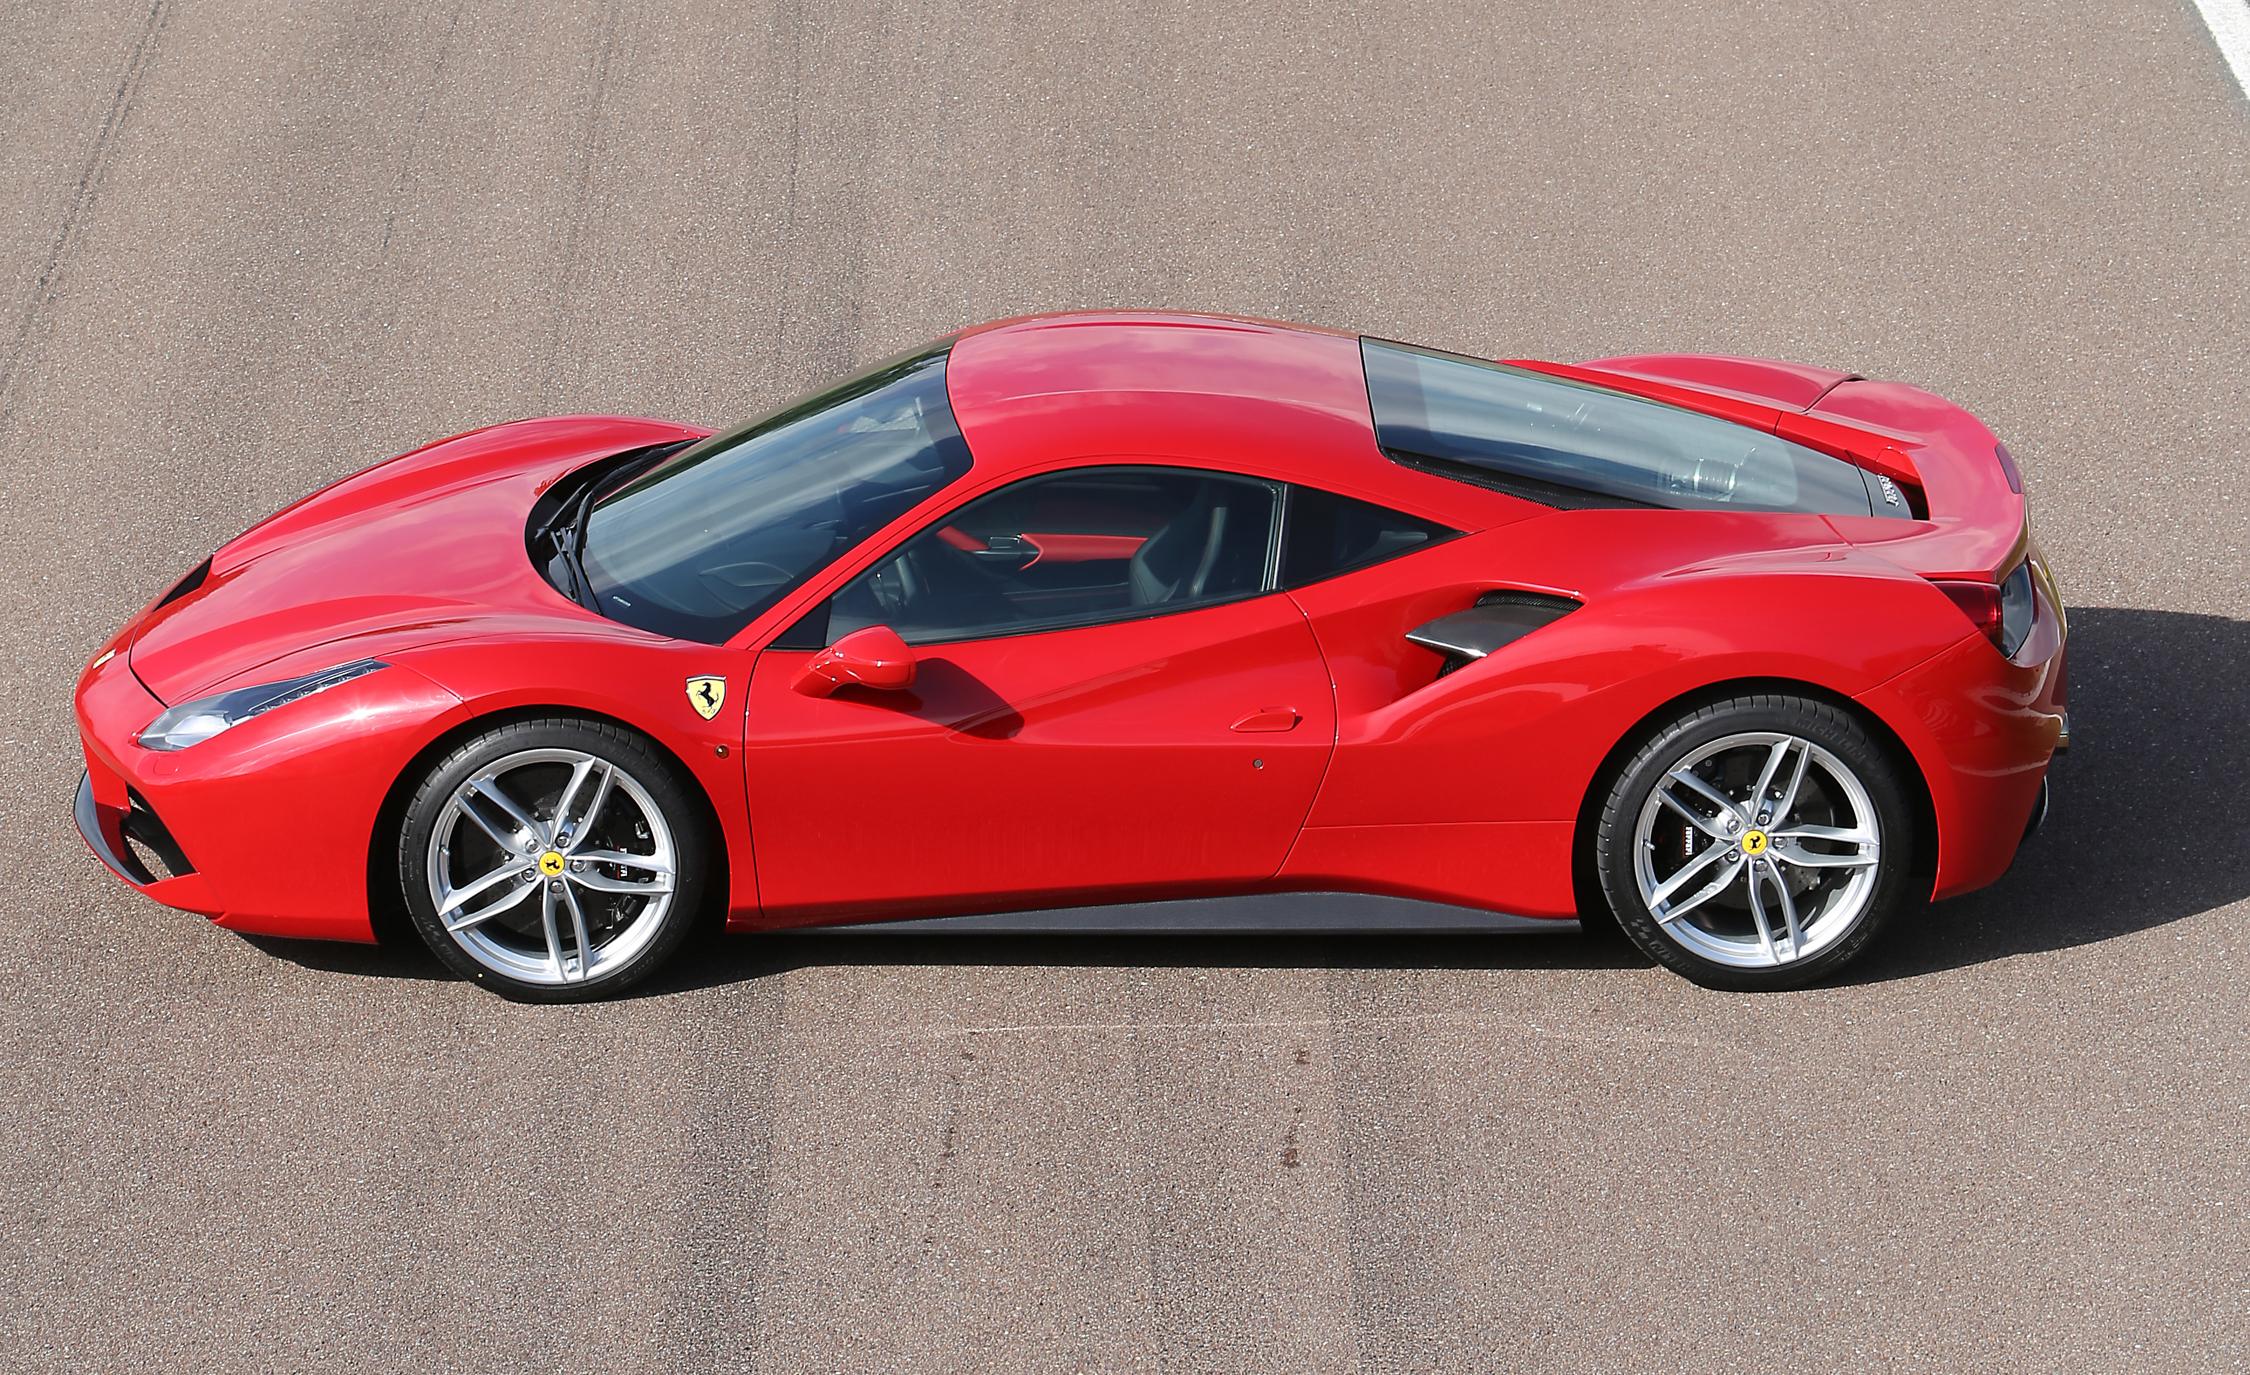 2016 Ferrari 488GTB Exterior Full Top and Side